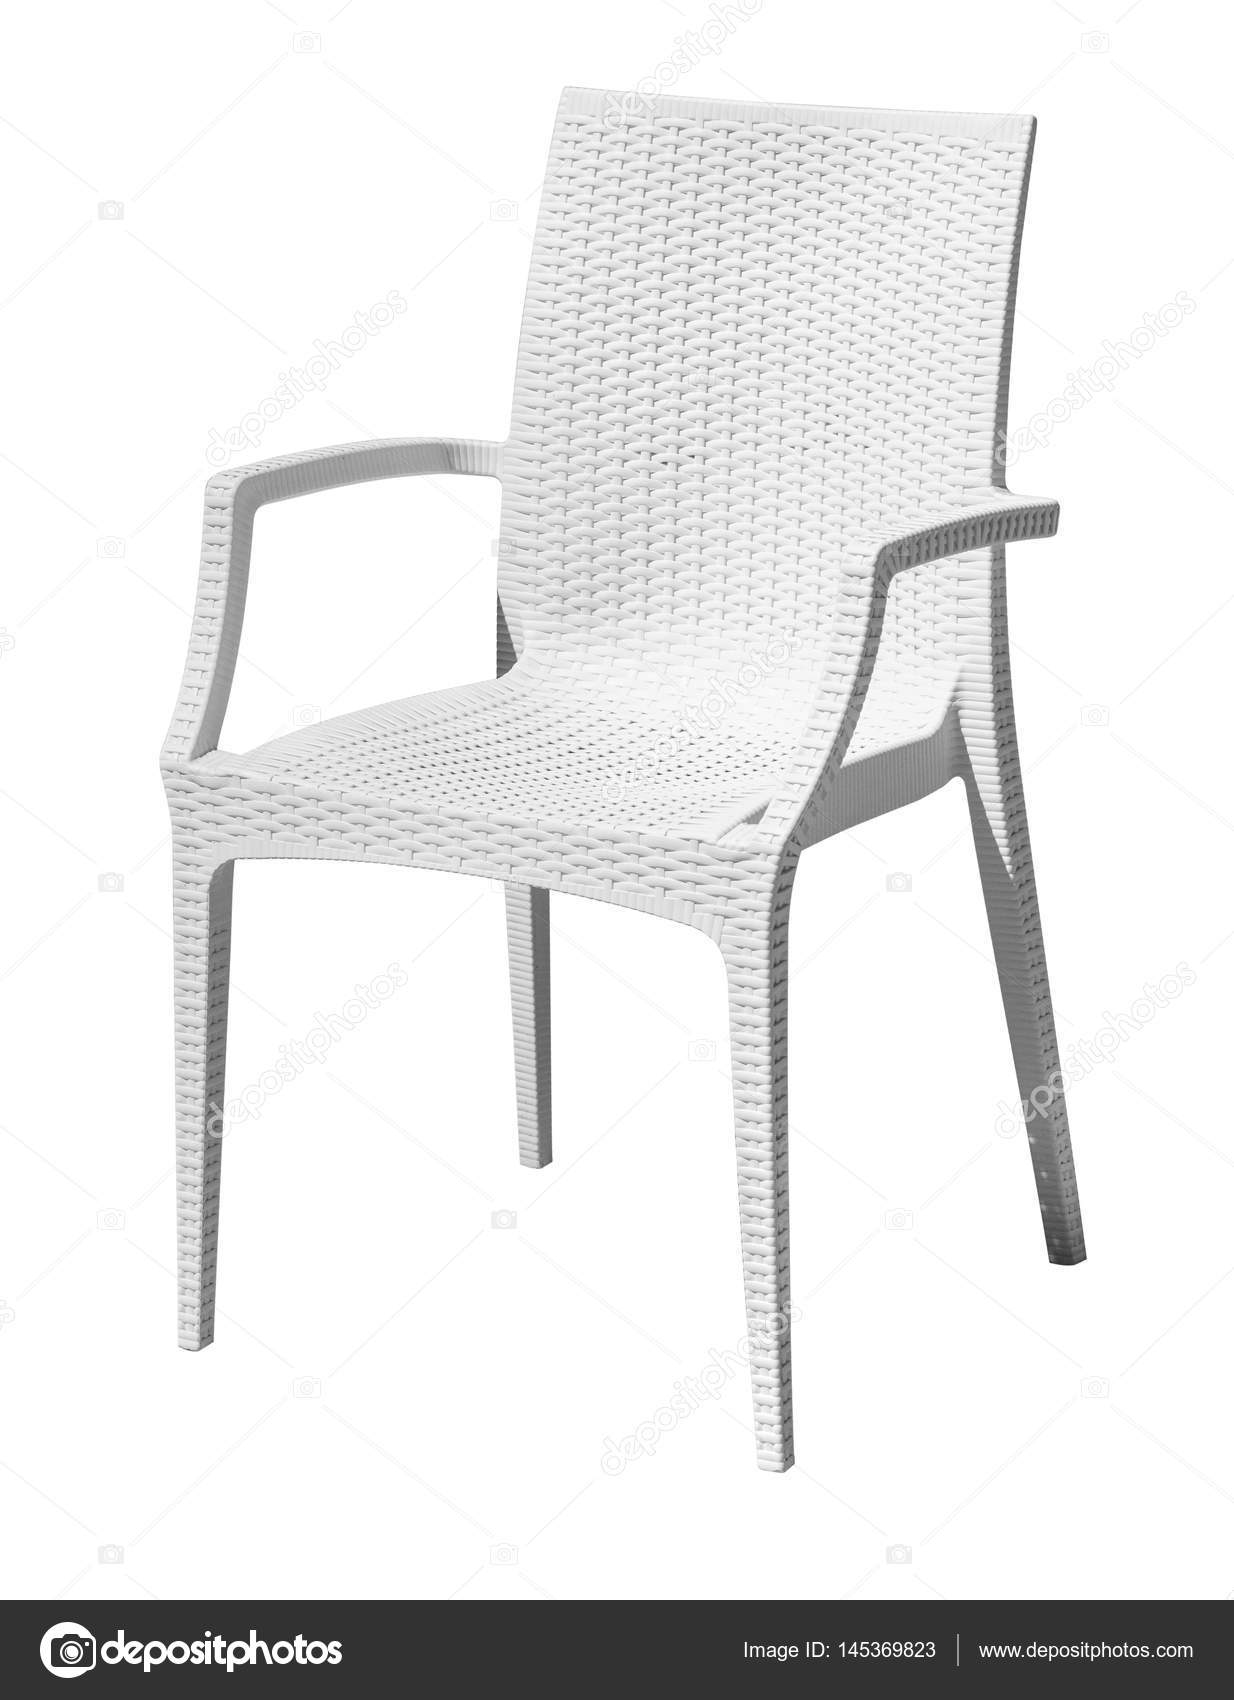 sedia in plastica bianca — Foto Stock © kornienkoalex #145369823